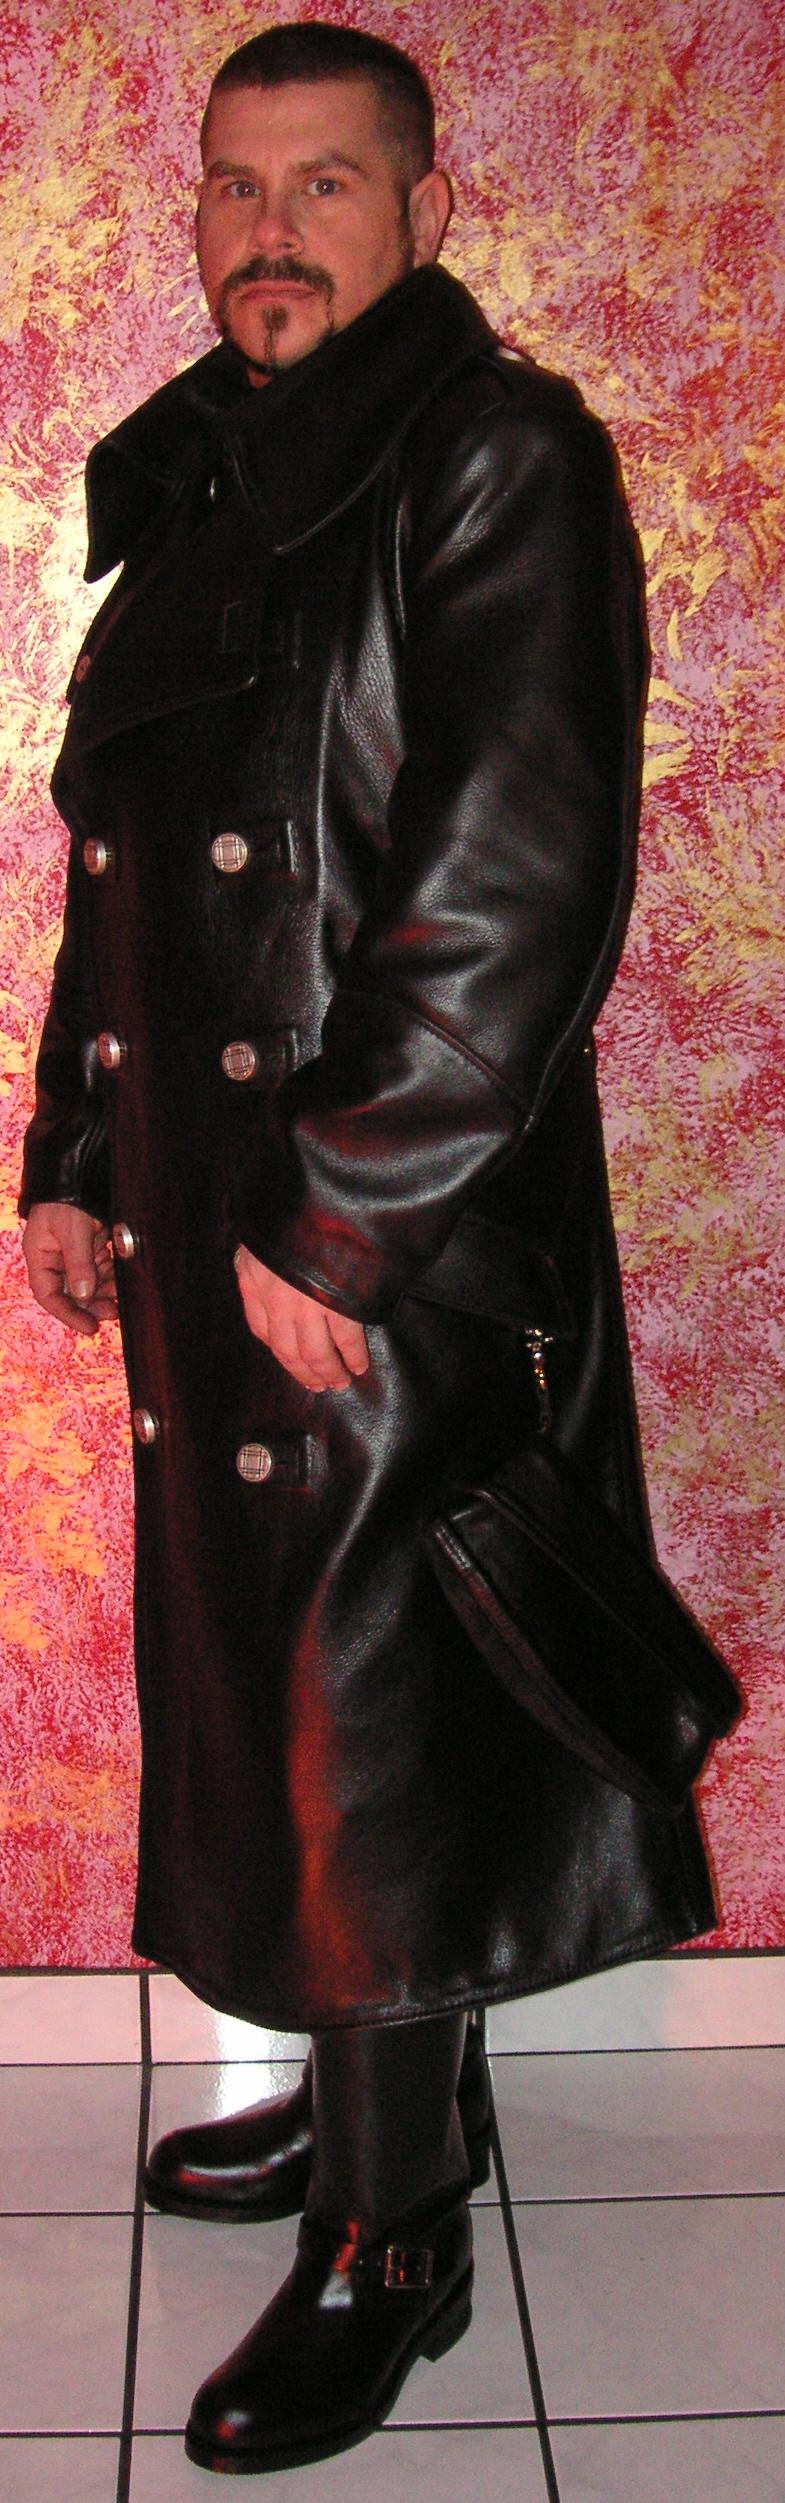 ron-leather-5.jpg